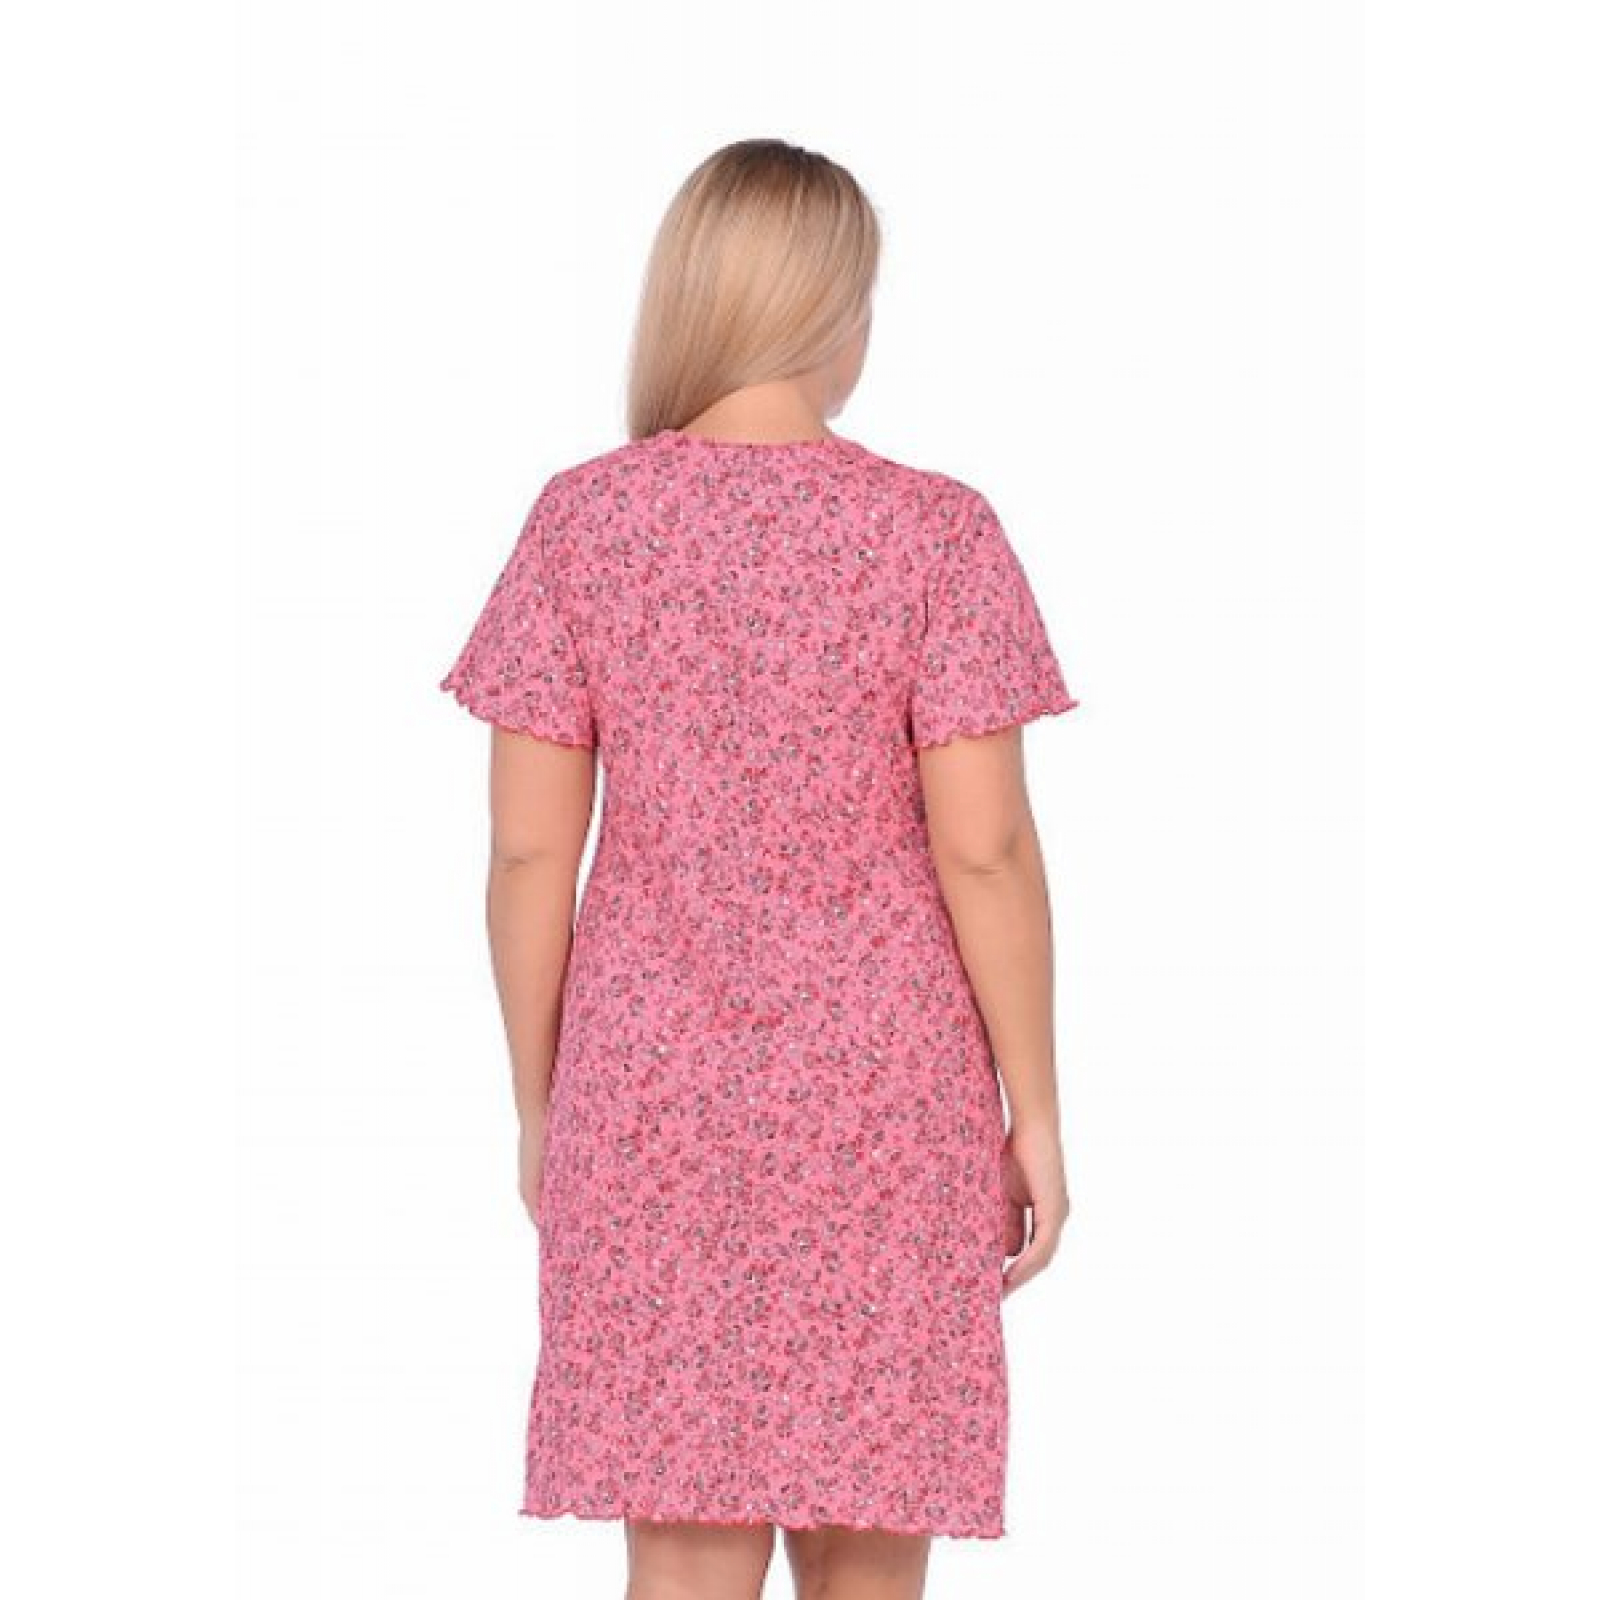 Сорочка Розовые цветочки М-0065Р